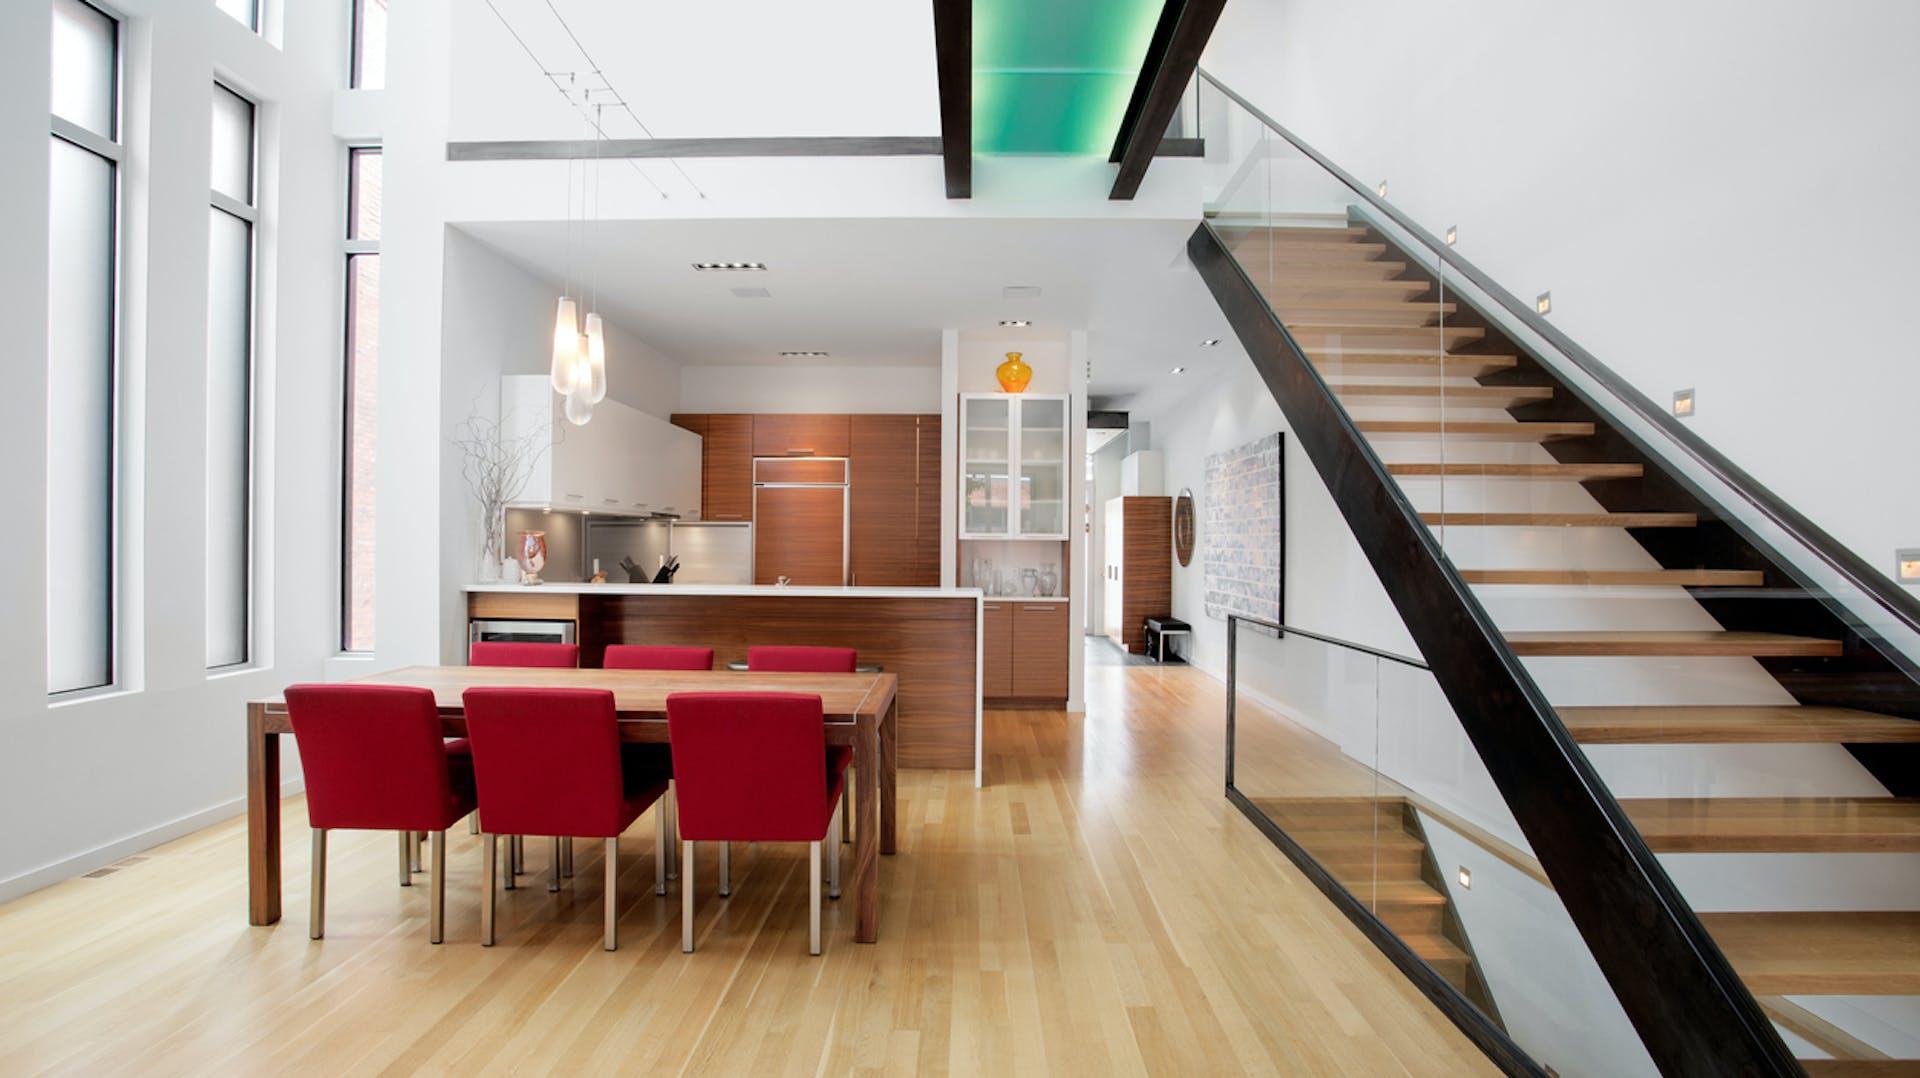 Kitchen, interior, modern, ceiling, home, furnished